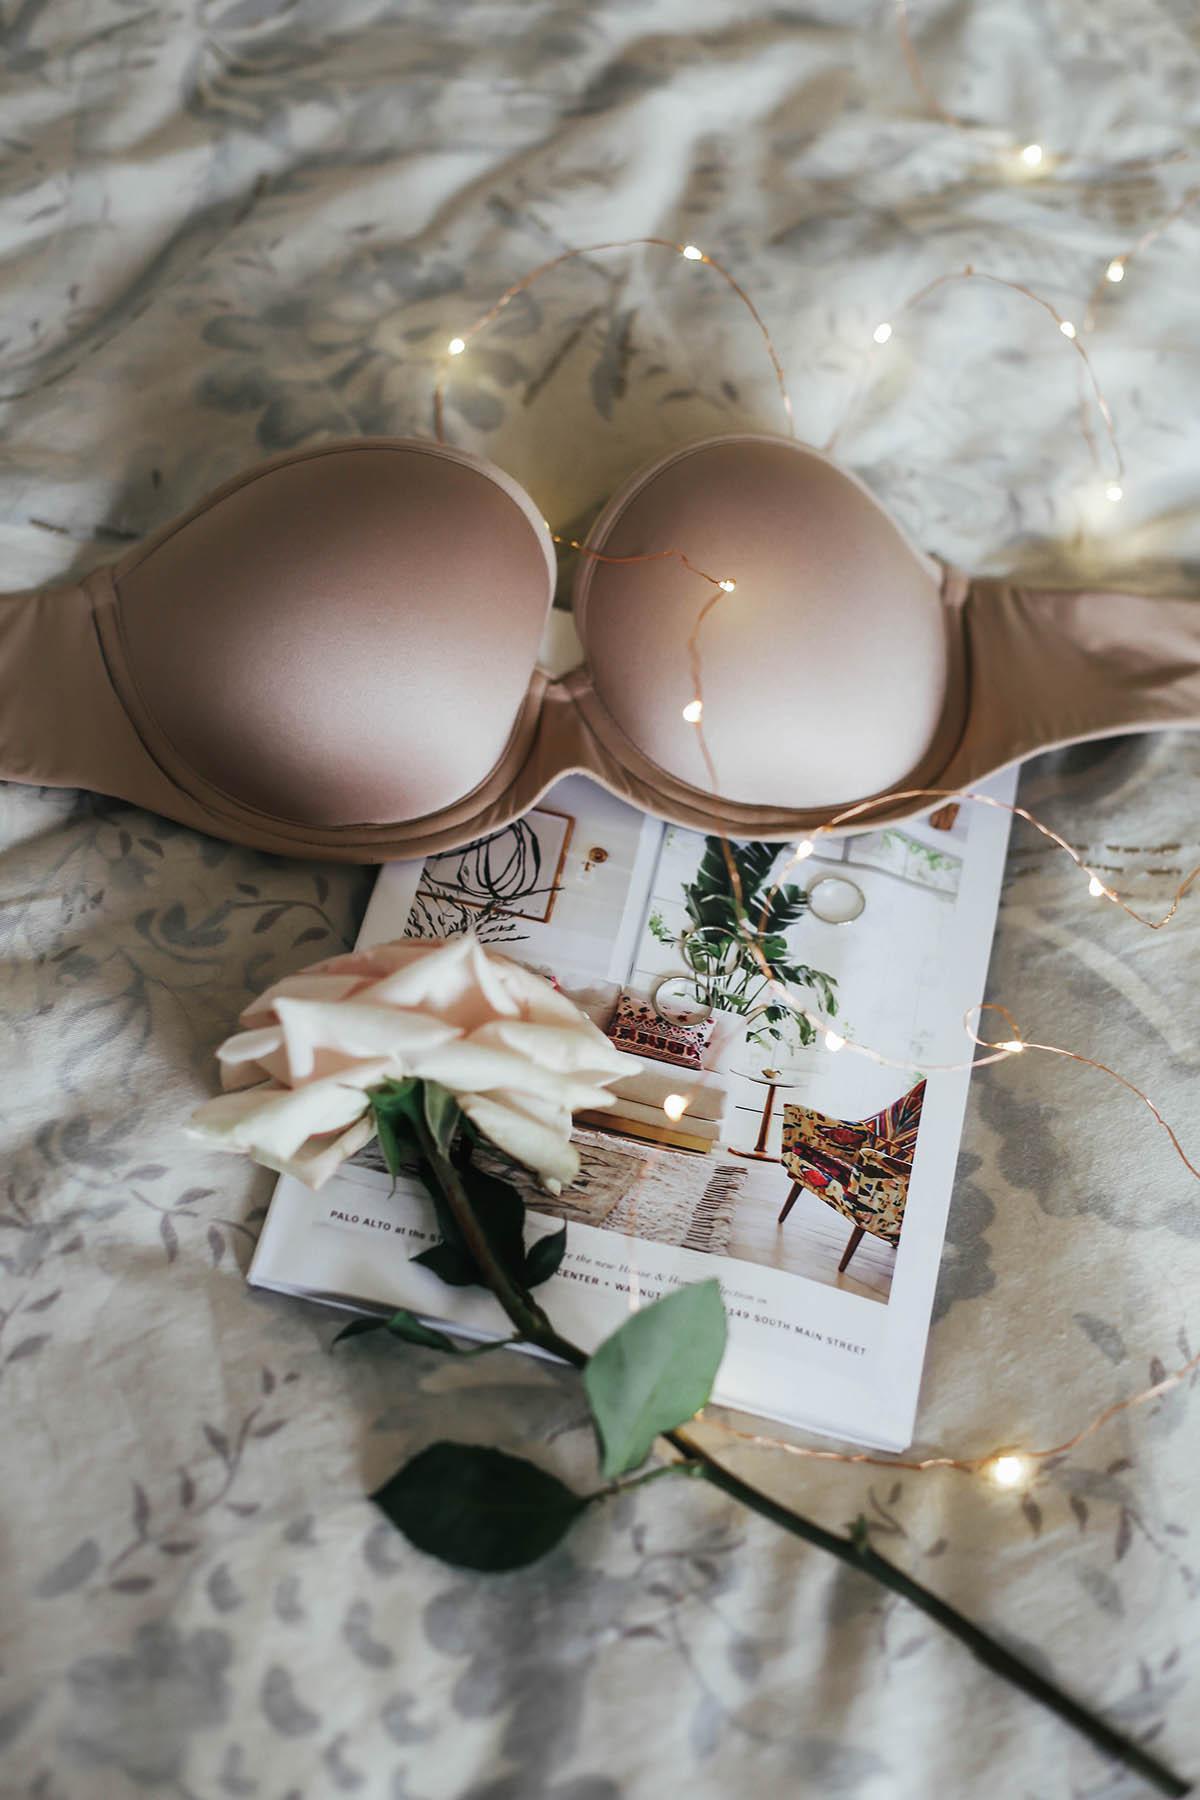 Building Your Bra Wardrobe: 3 More Bras Every Girl Needs